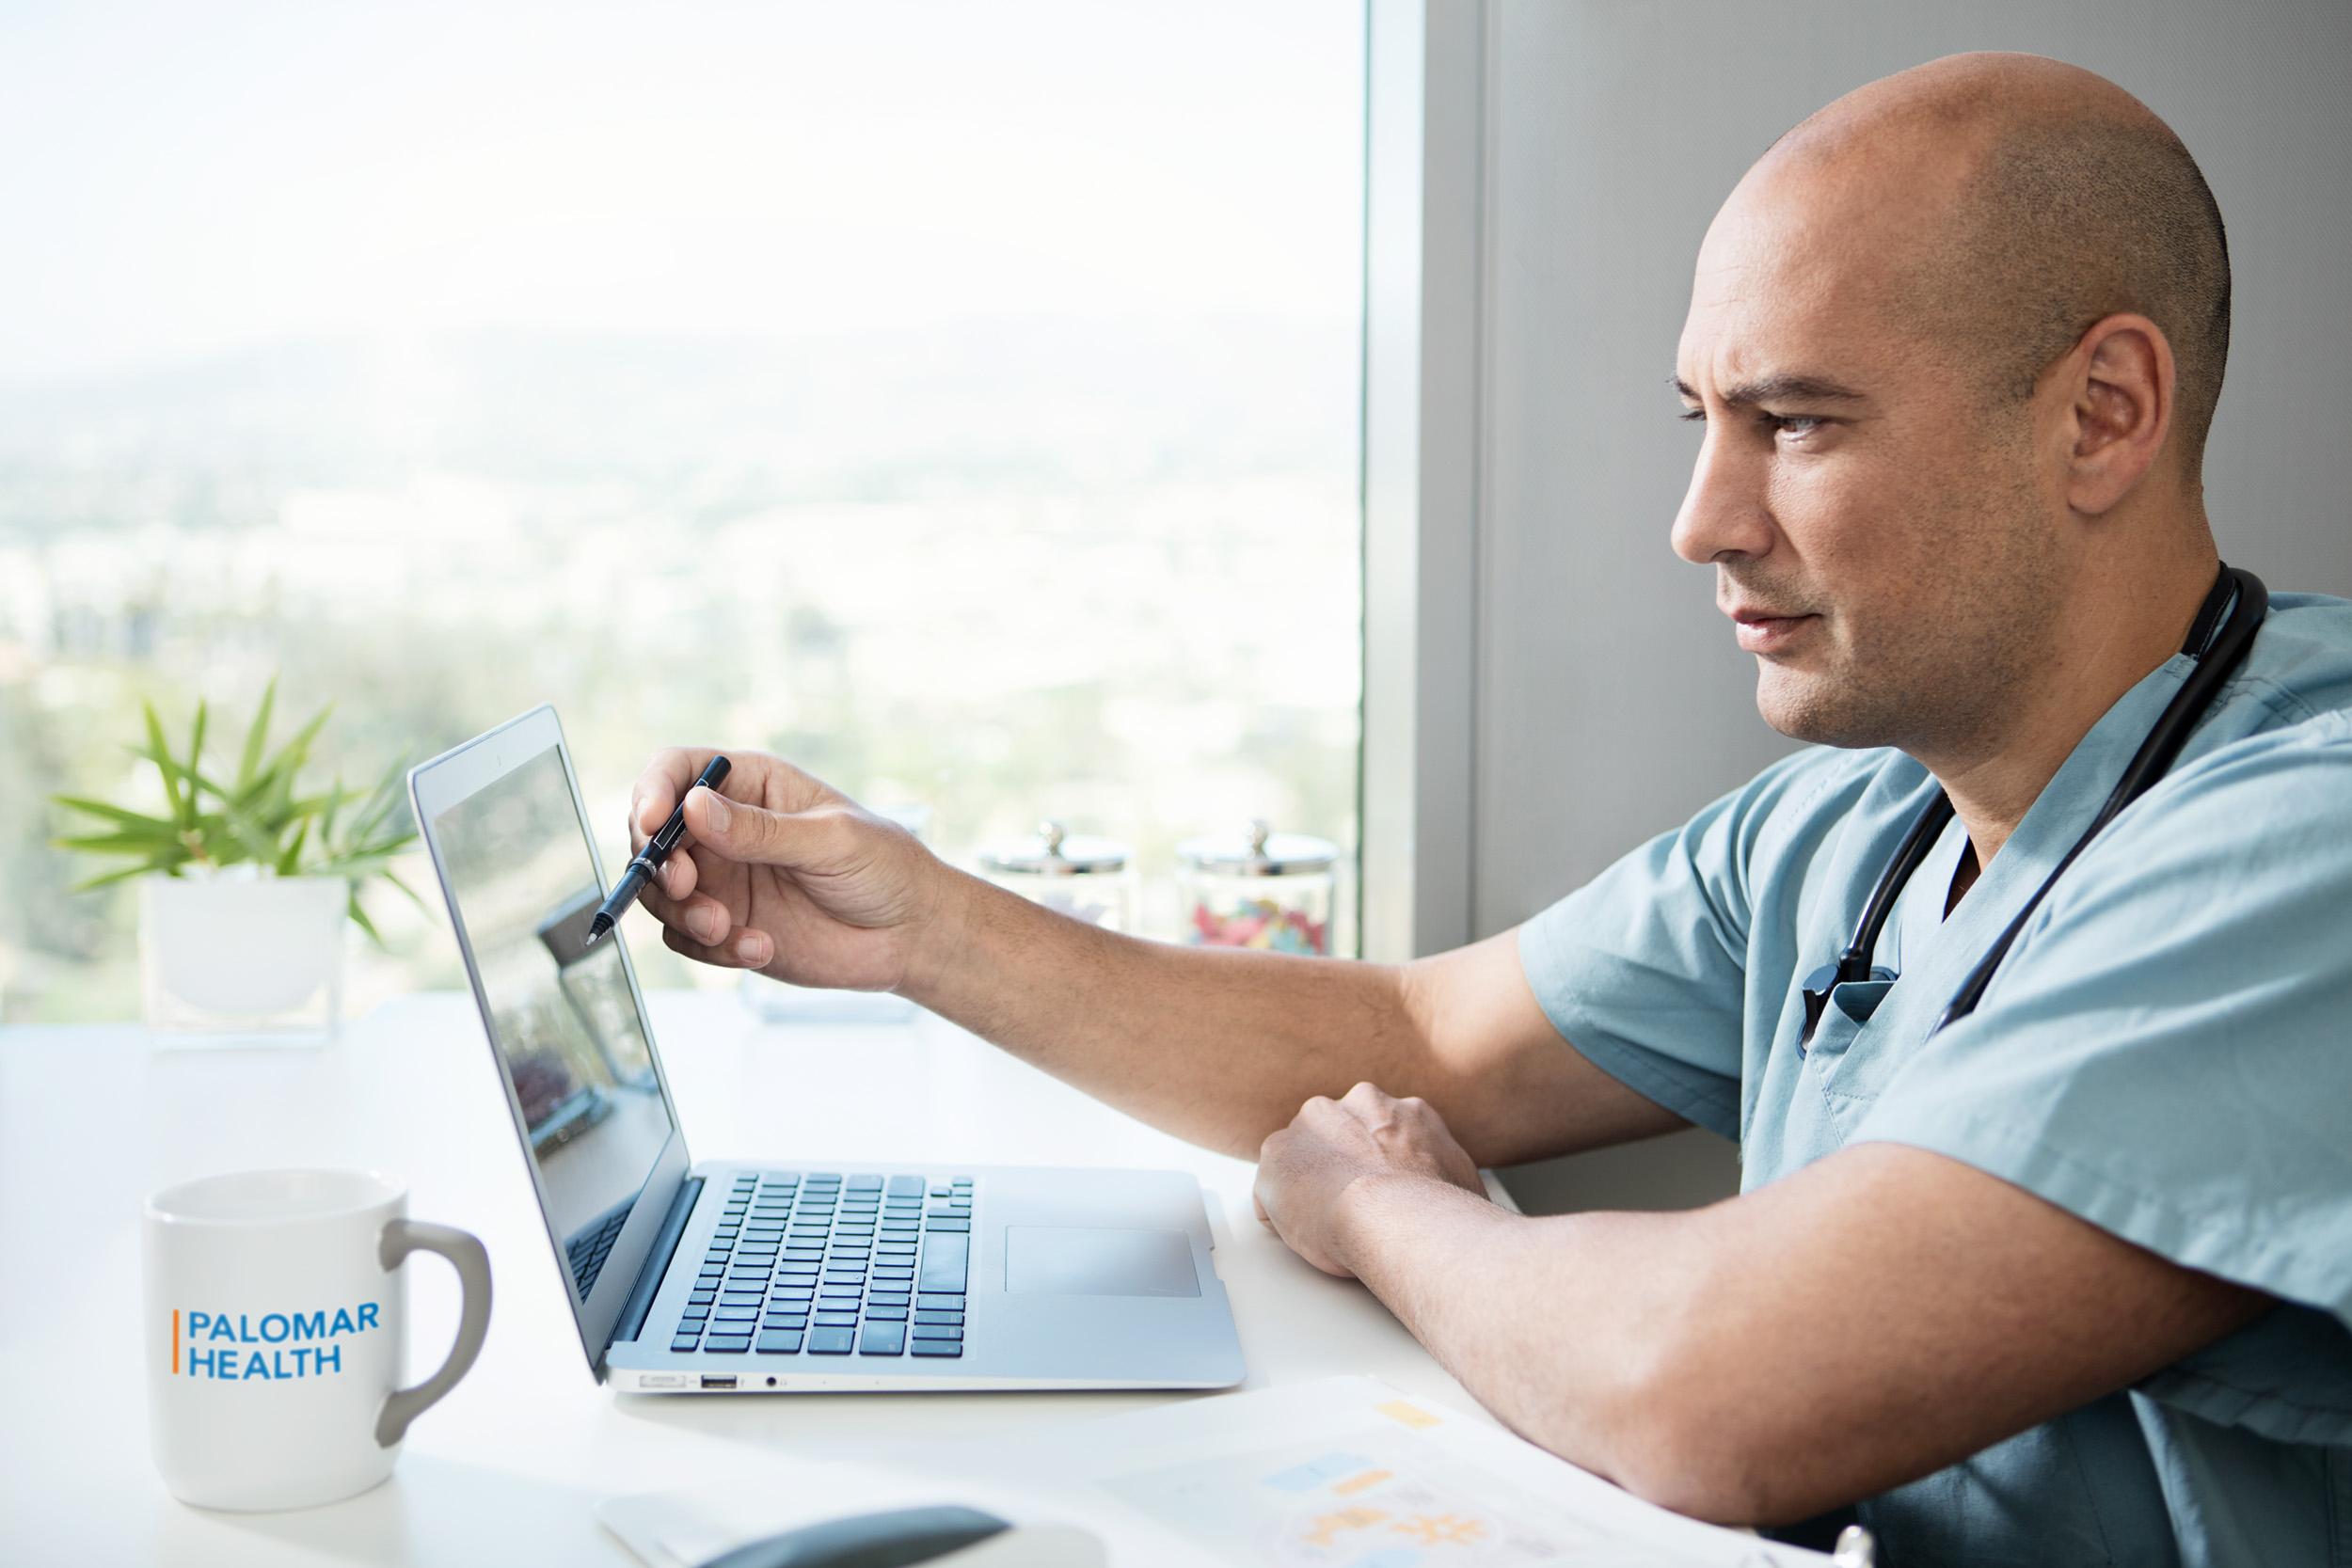 29_healthcare_photography_medical_photographer_advertising.jpg